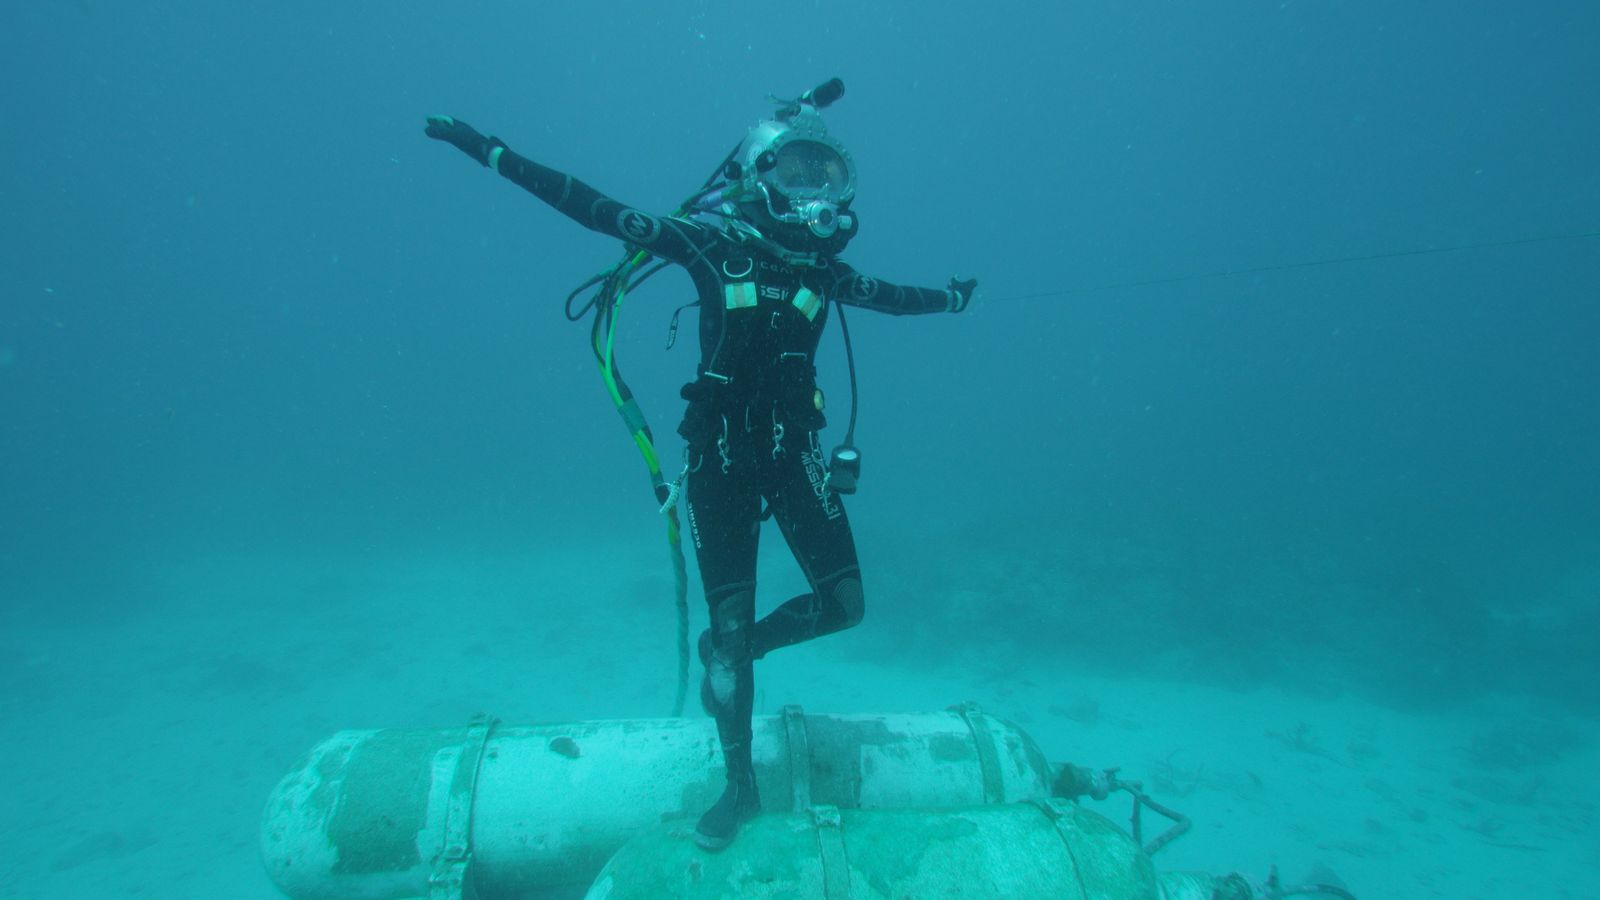 Grace dances outside Aquarius, her underwater home for 15 days during Mission 31. Photo: Fabien Cousteau ...